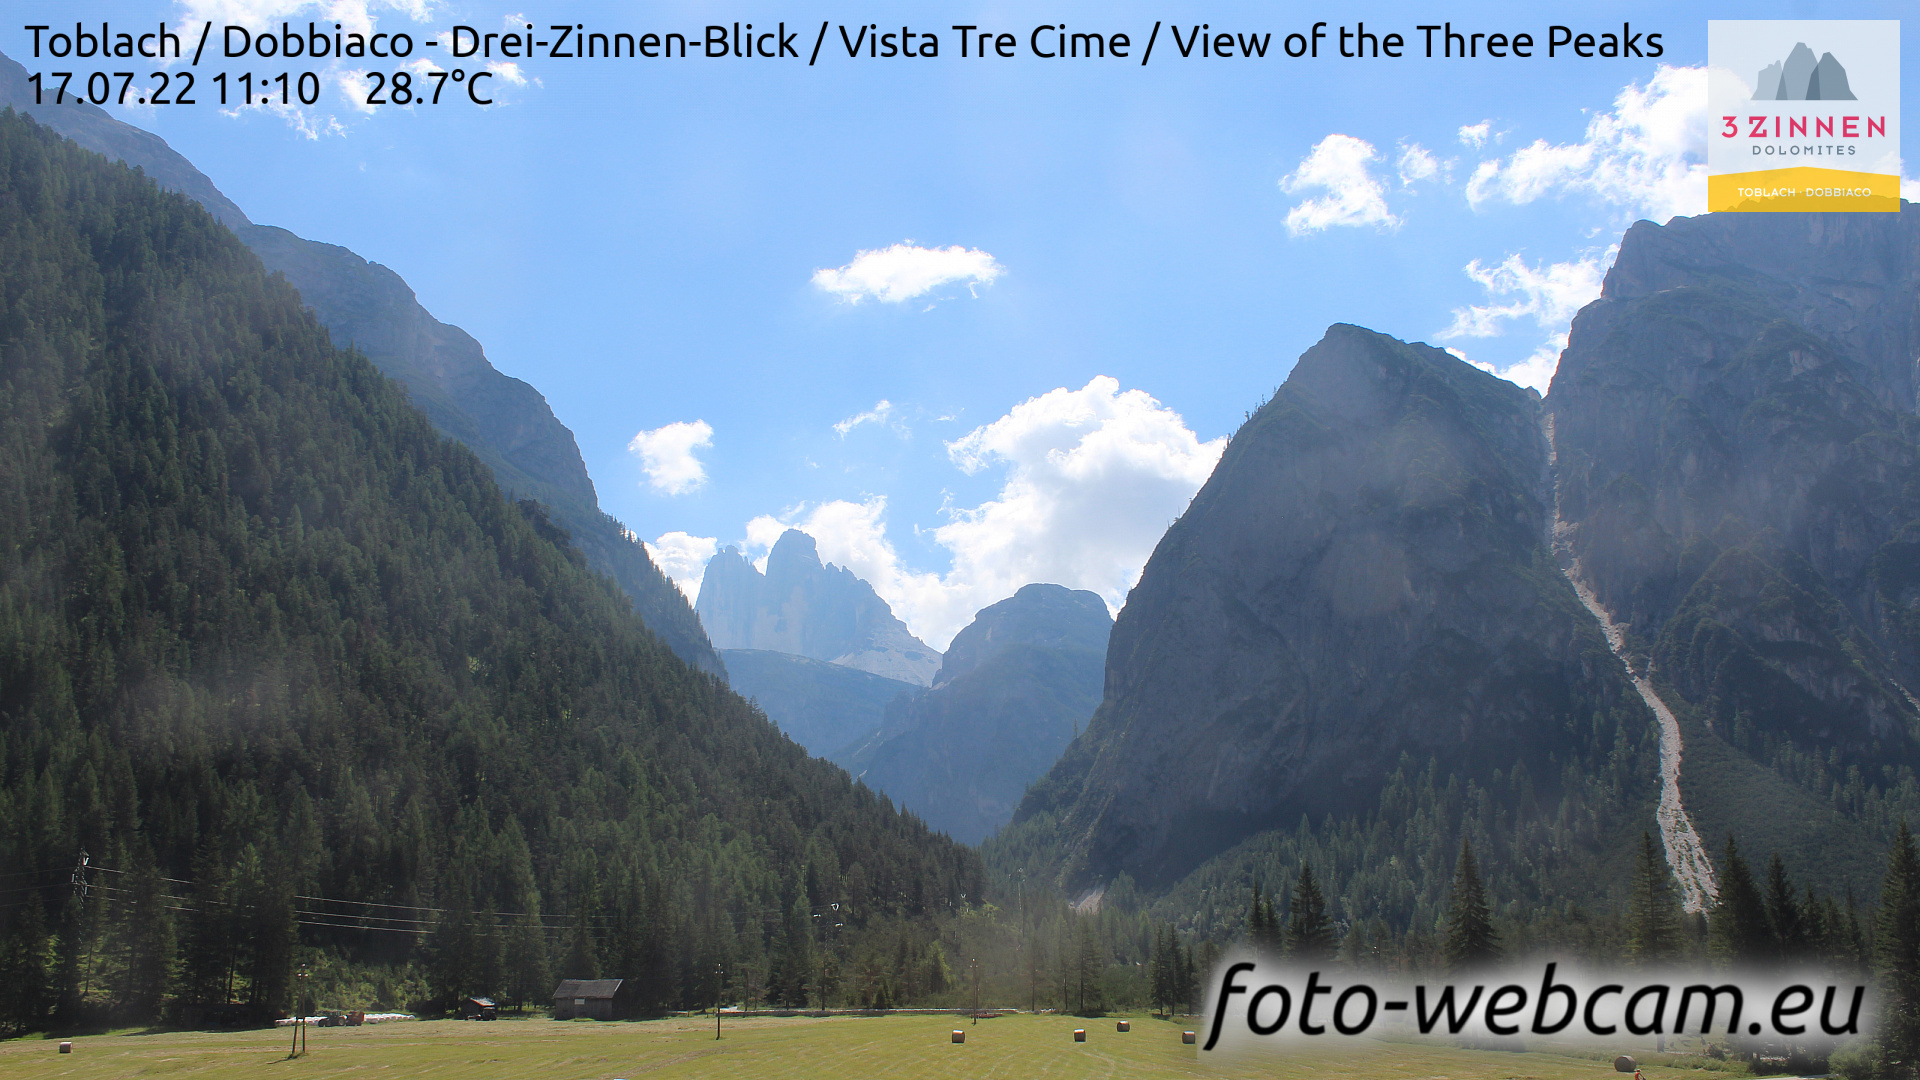 Toblach (Dolomiten) Do. 11:27